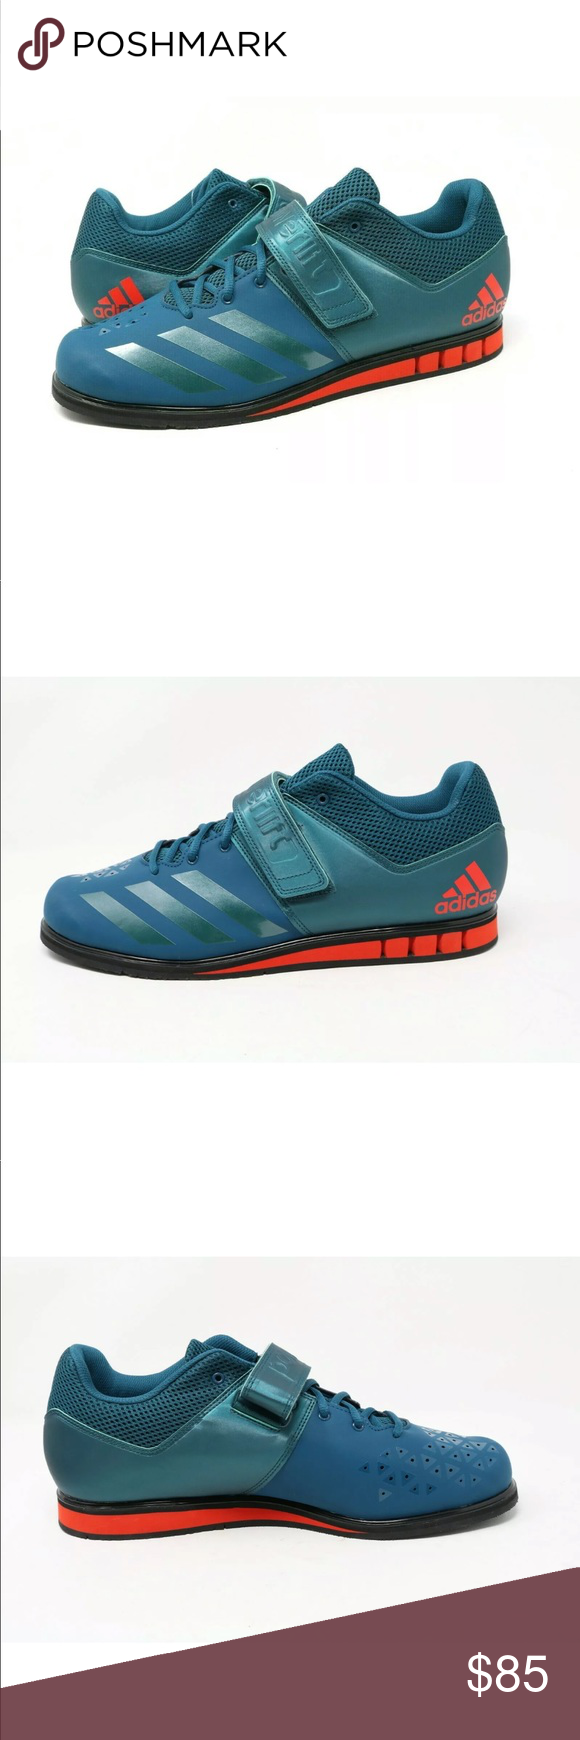 adidas powerlift 3.1 weightlifting shoes petrol